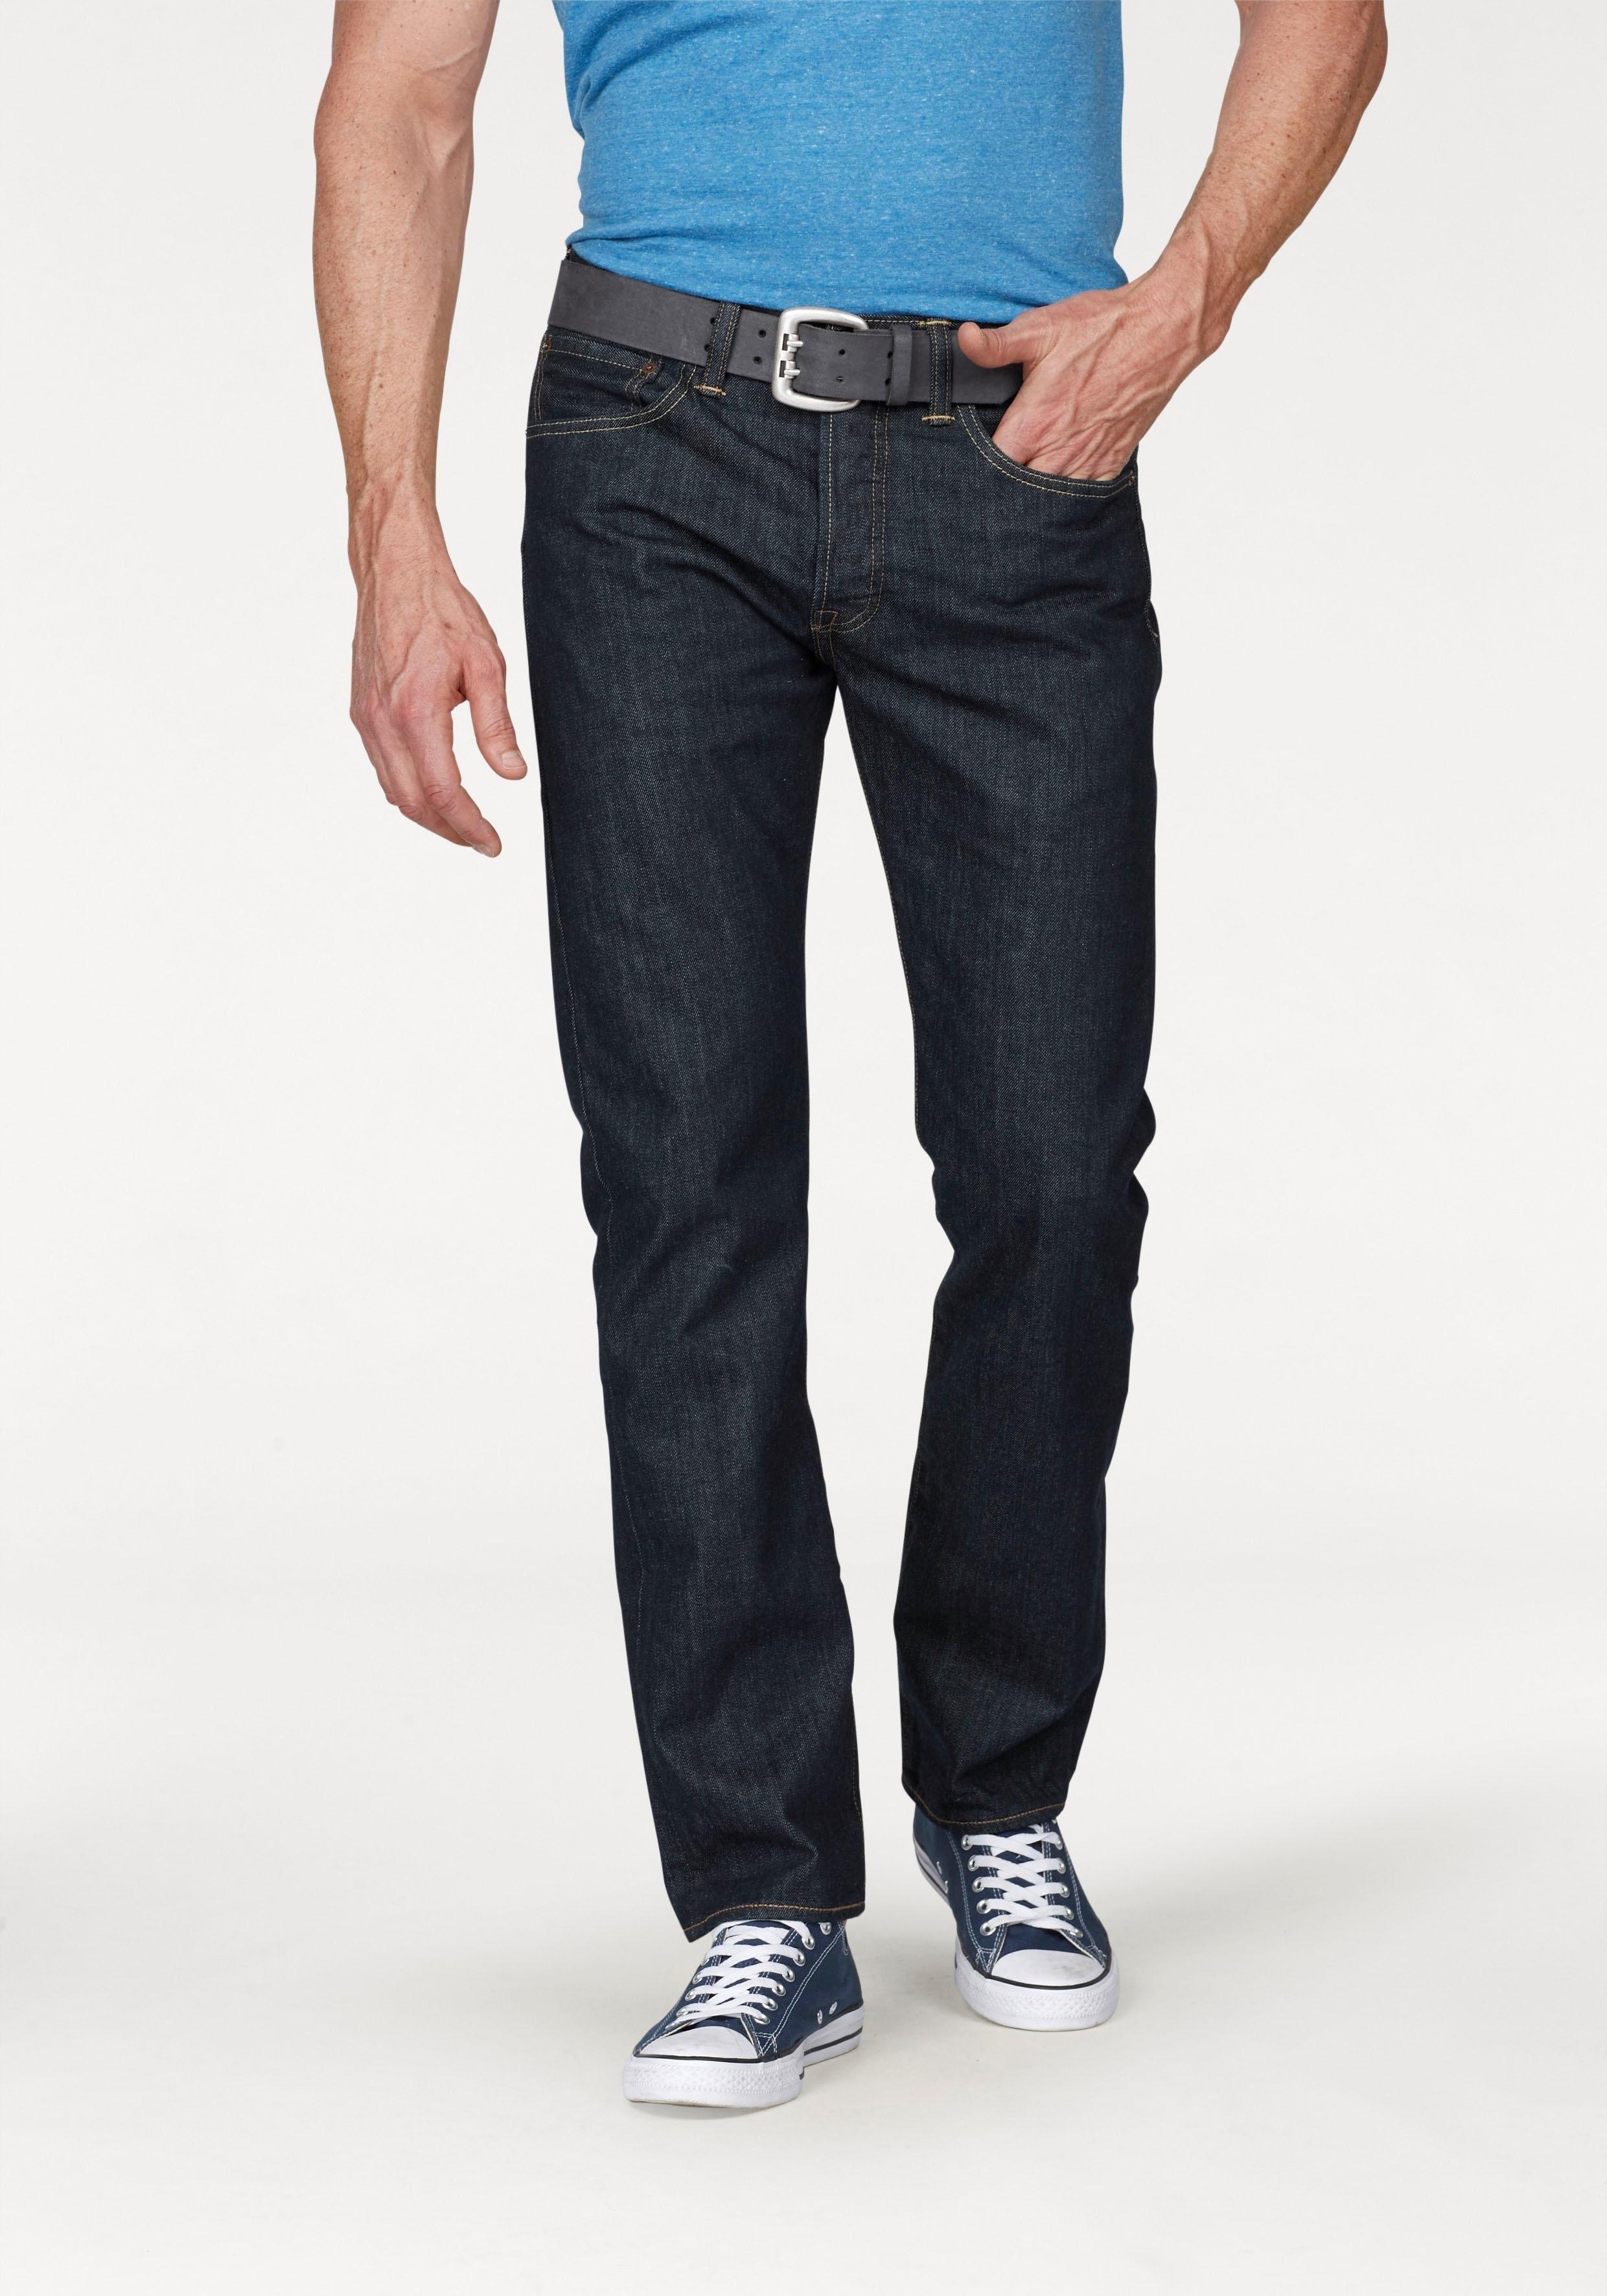 LEVI'S Jeans, 501 - verschillende betaalmethodes